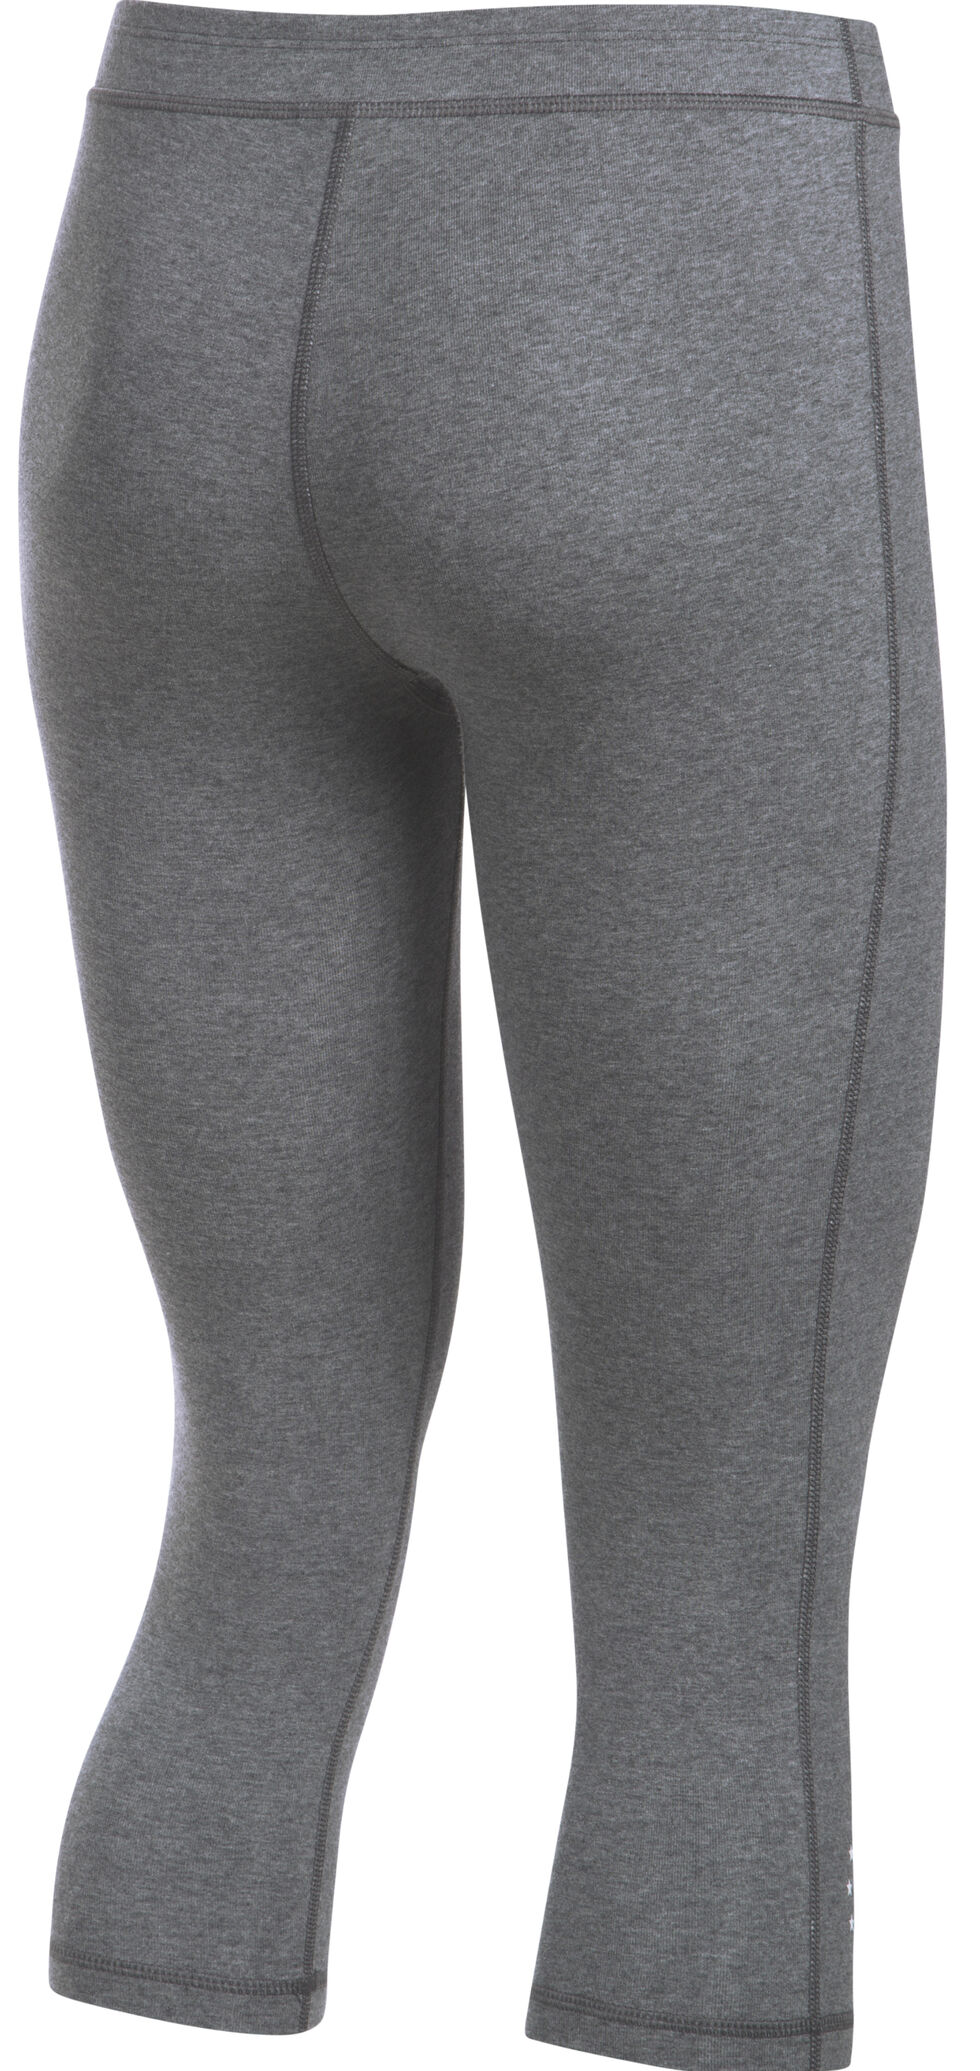 Under Armour Women's Charcoal Grey HeatGear® Training Capris, Charcoal Grey, hi-res